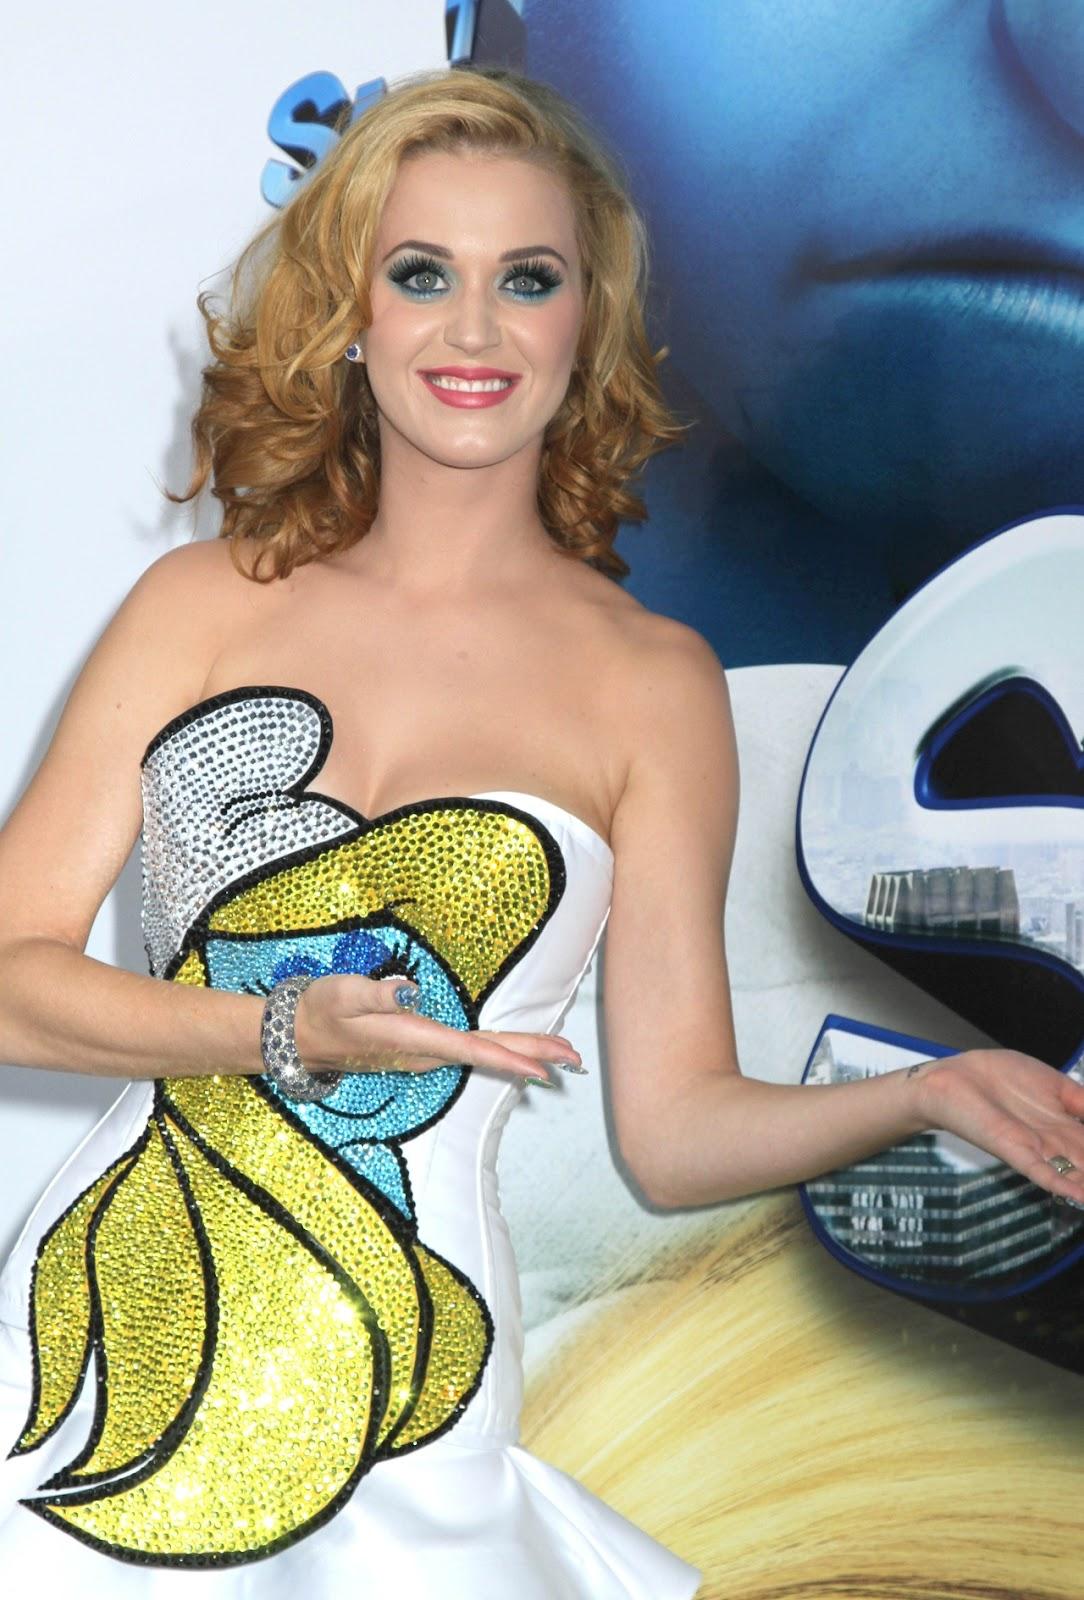 http://3.bp.blogspot.com/-YLbZUS-JBfs/UCszP7oWP3I/AAAAAAAALUc/6MhrAT1r1po/s1600/Katy+Perry+Smurf+Outfit+(4).jpg